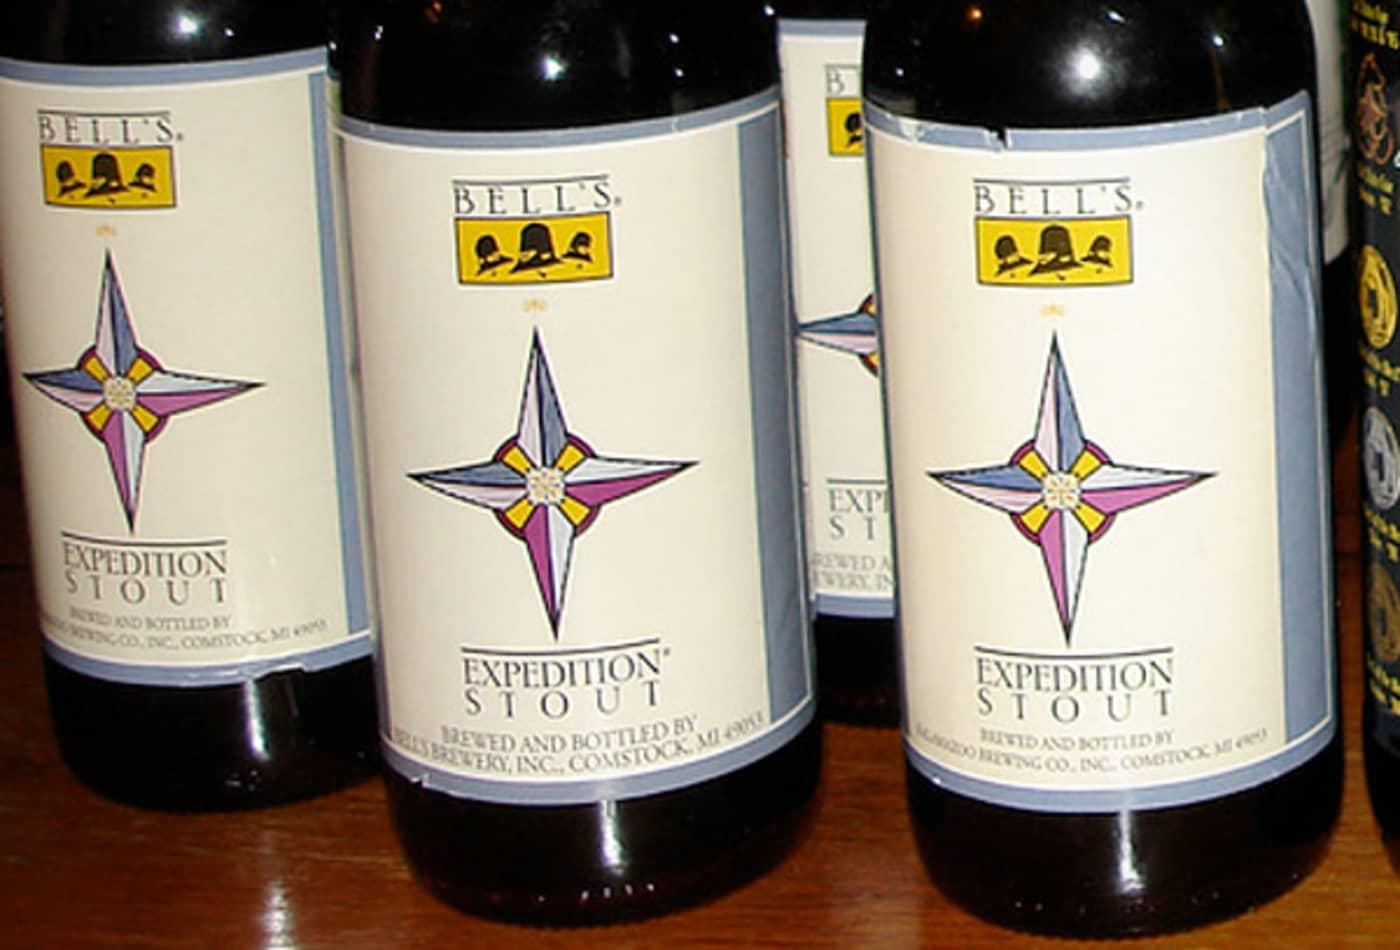 beer-bells-expedition.jpg